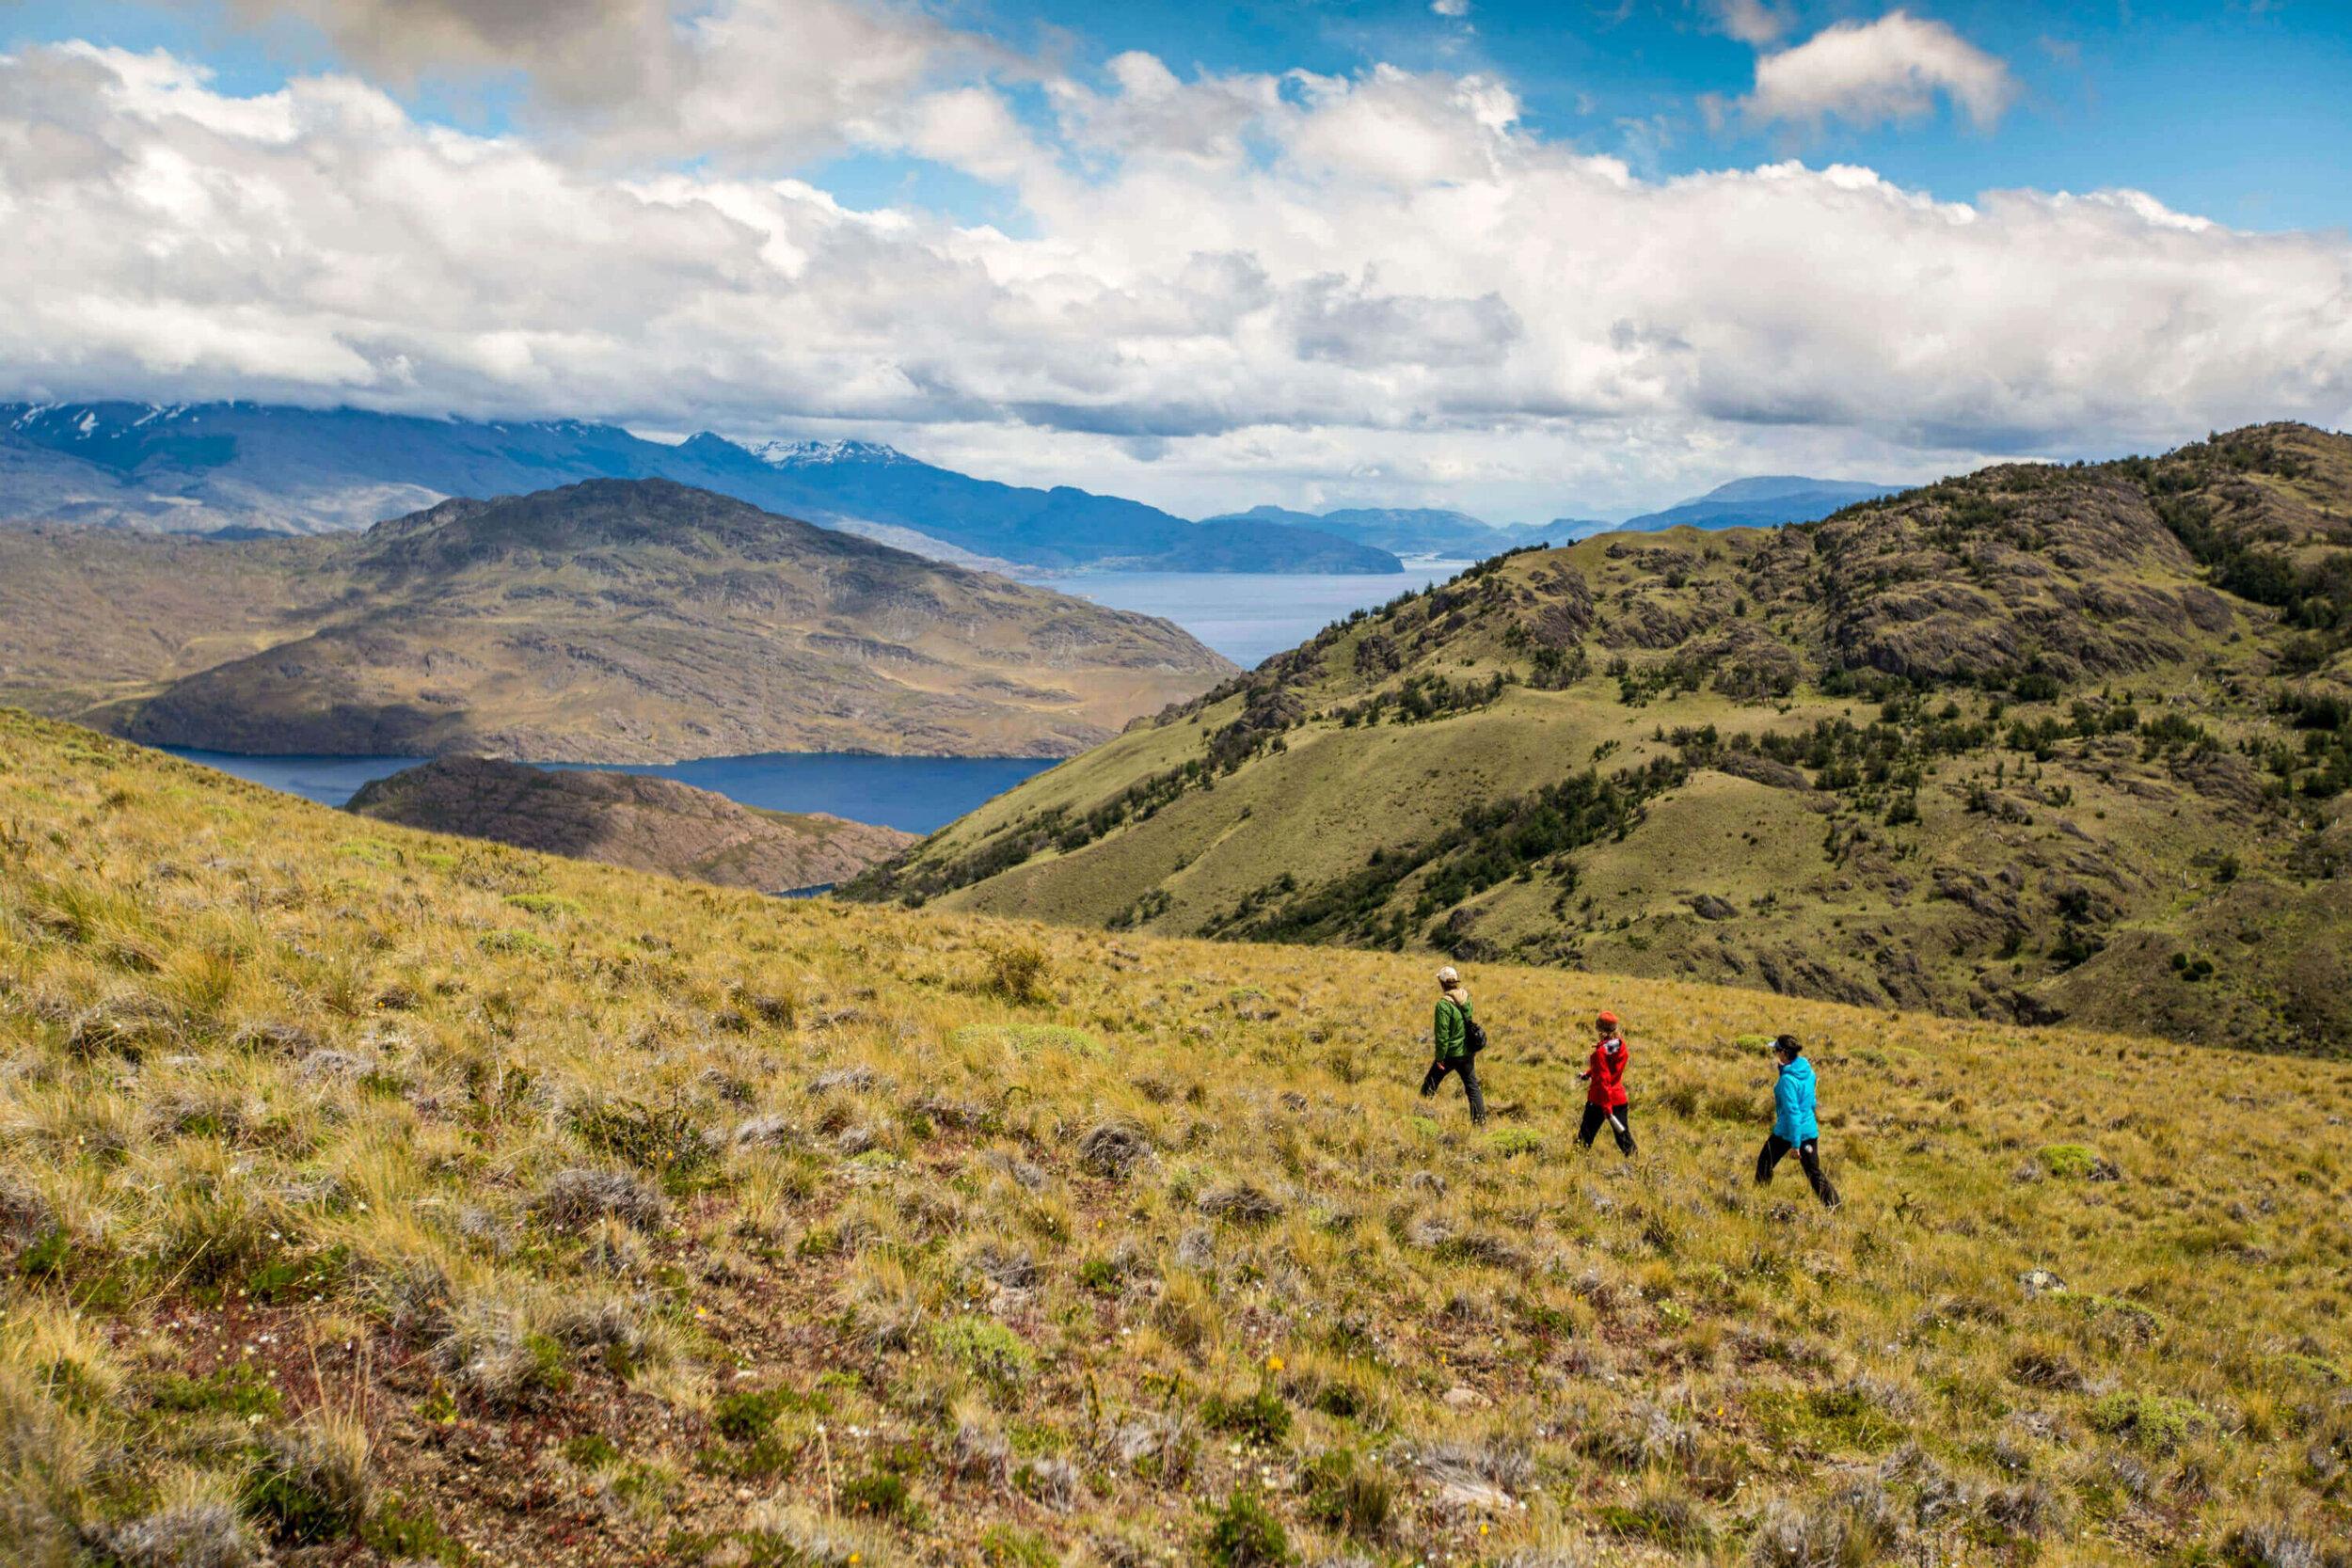 Parque-Nacional-Patagonia-6.jpg